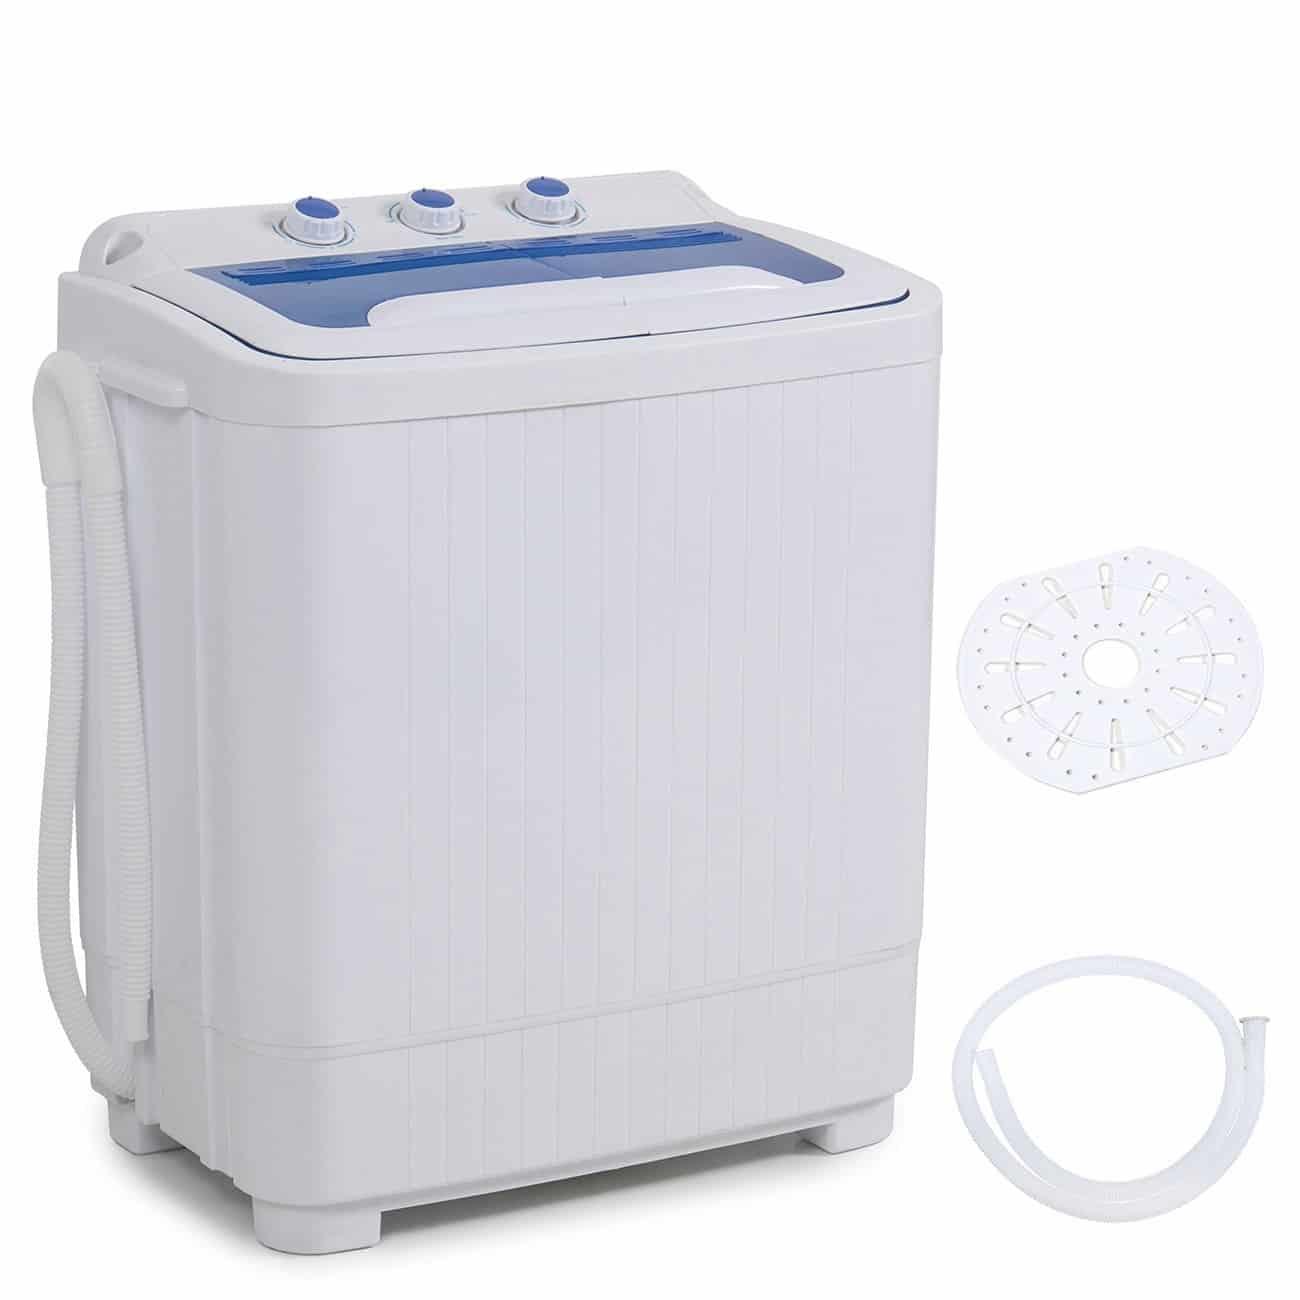 Della mini washing machine portable compact washer